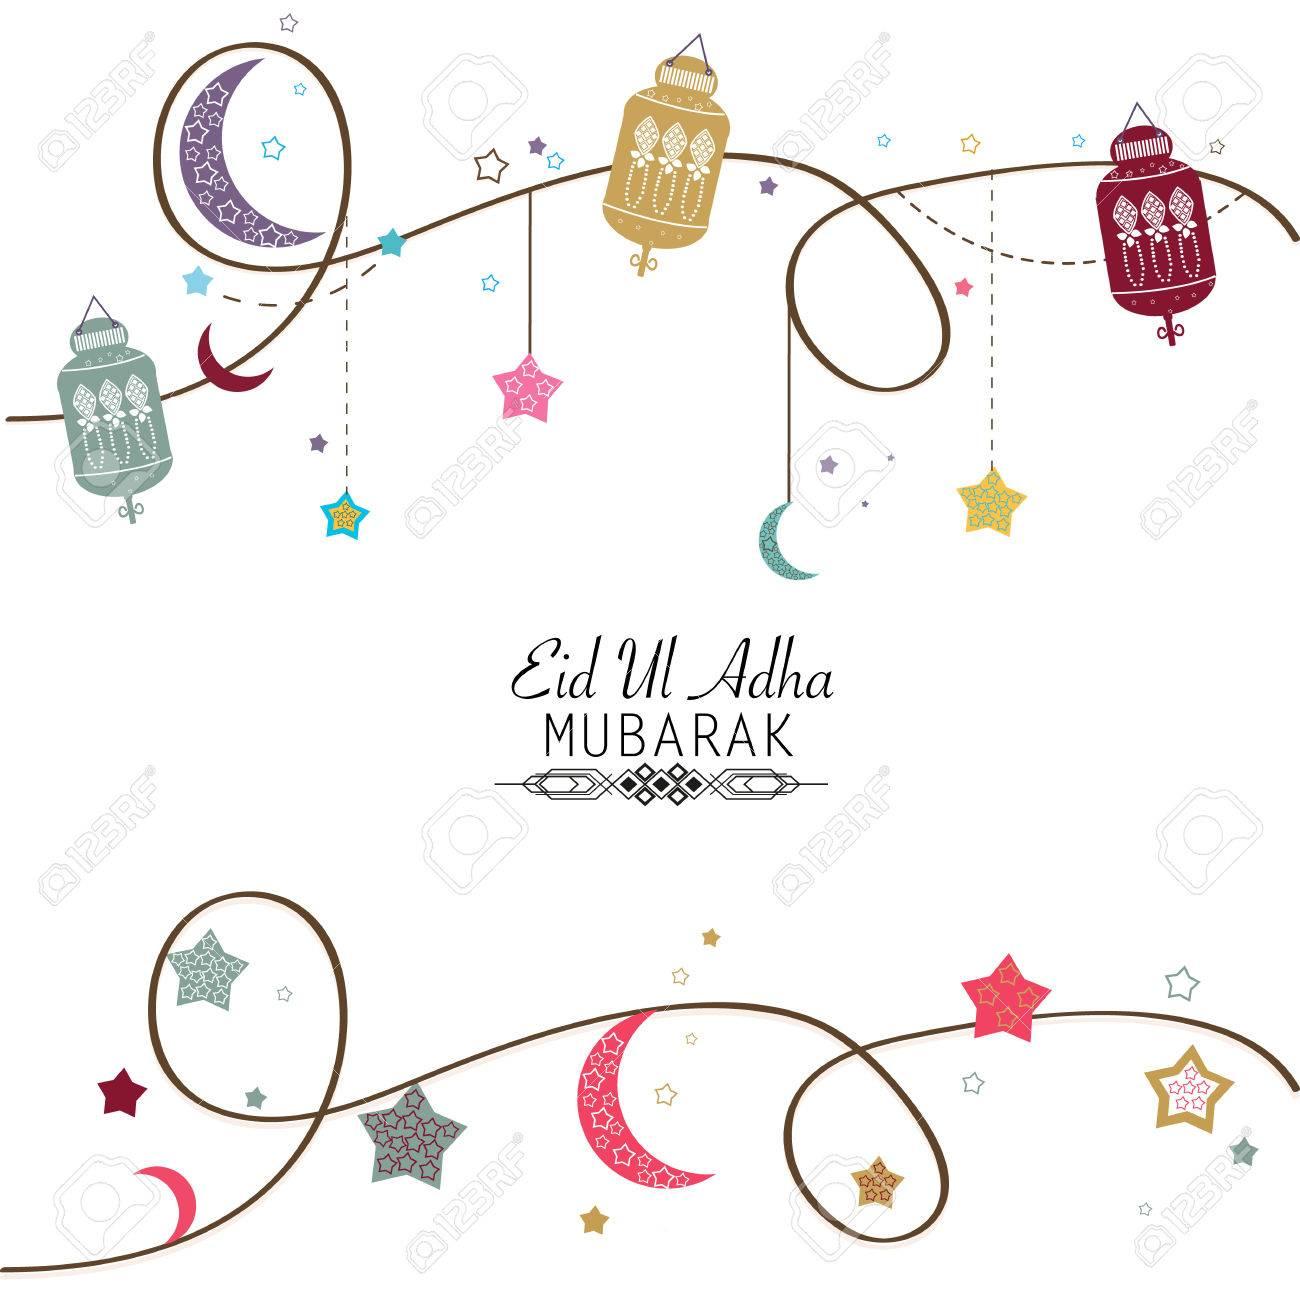 Islamic Festival Of Sacrifice Eid Ul Adha Celebration Greeting